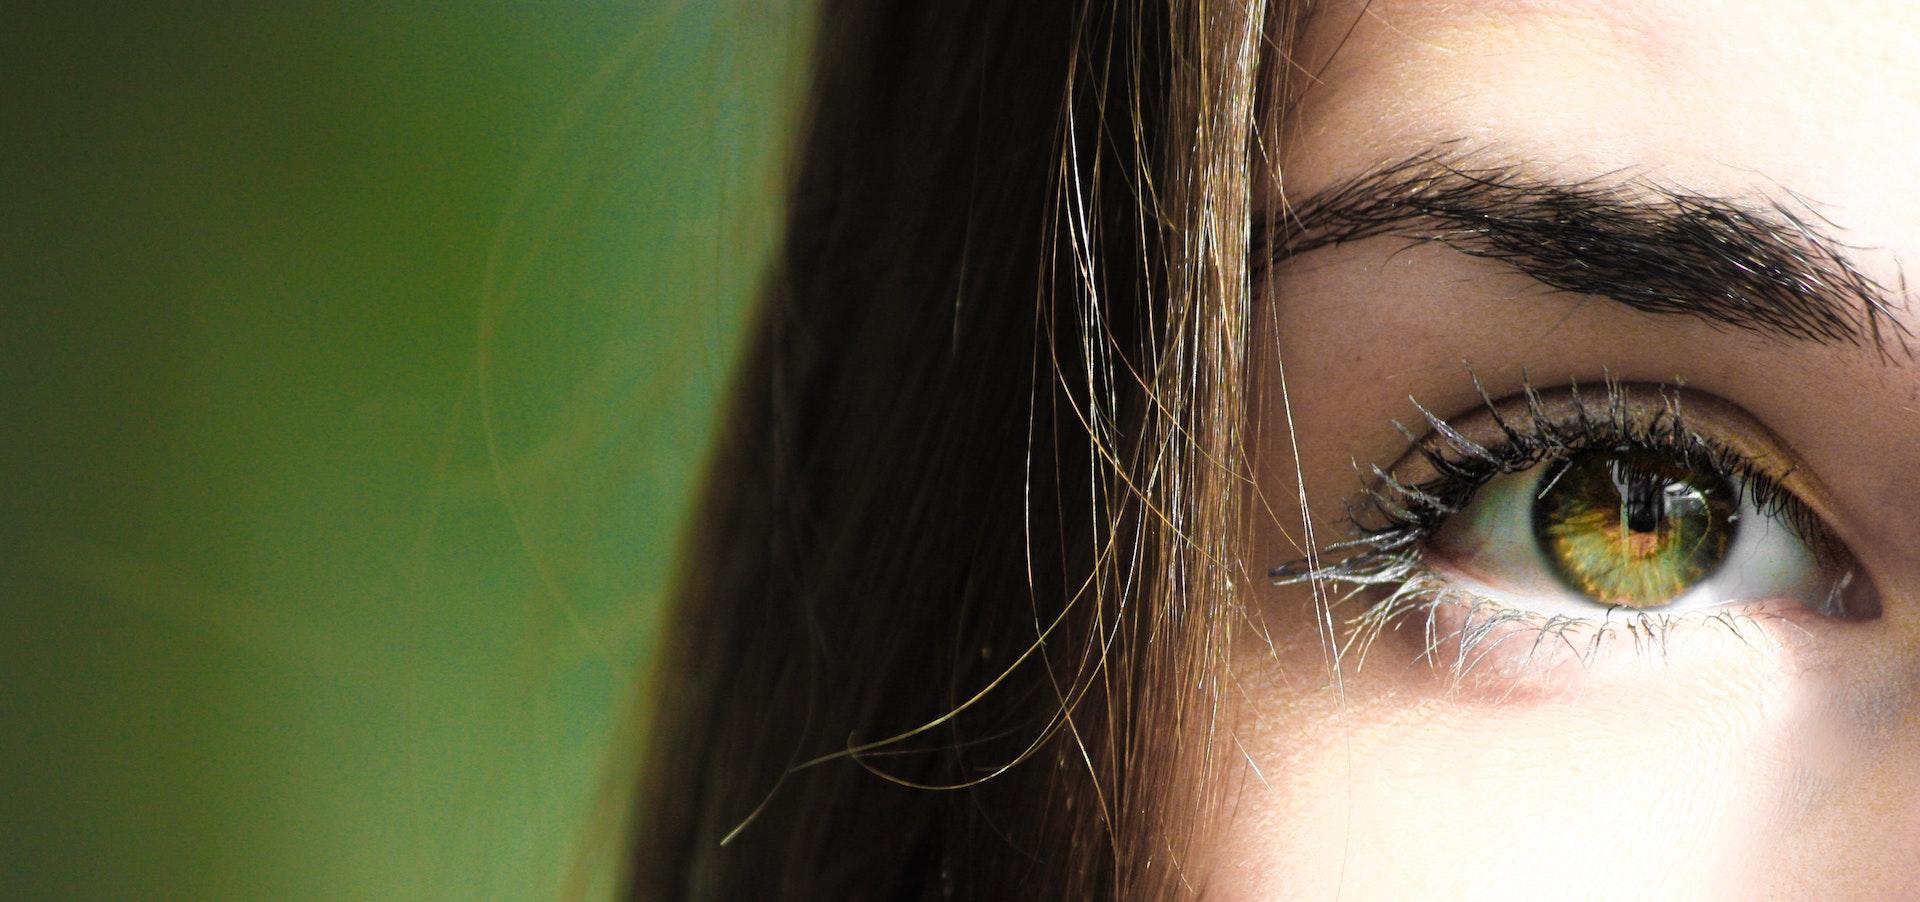 eye fovea sharpest vision